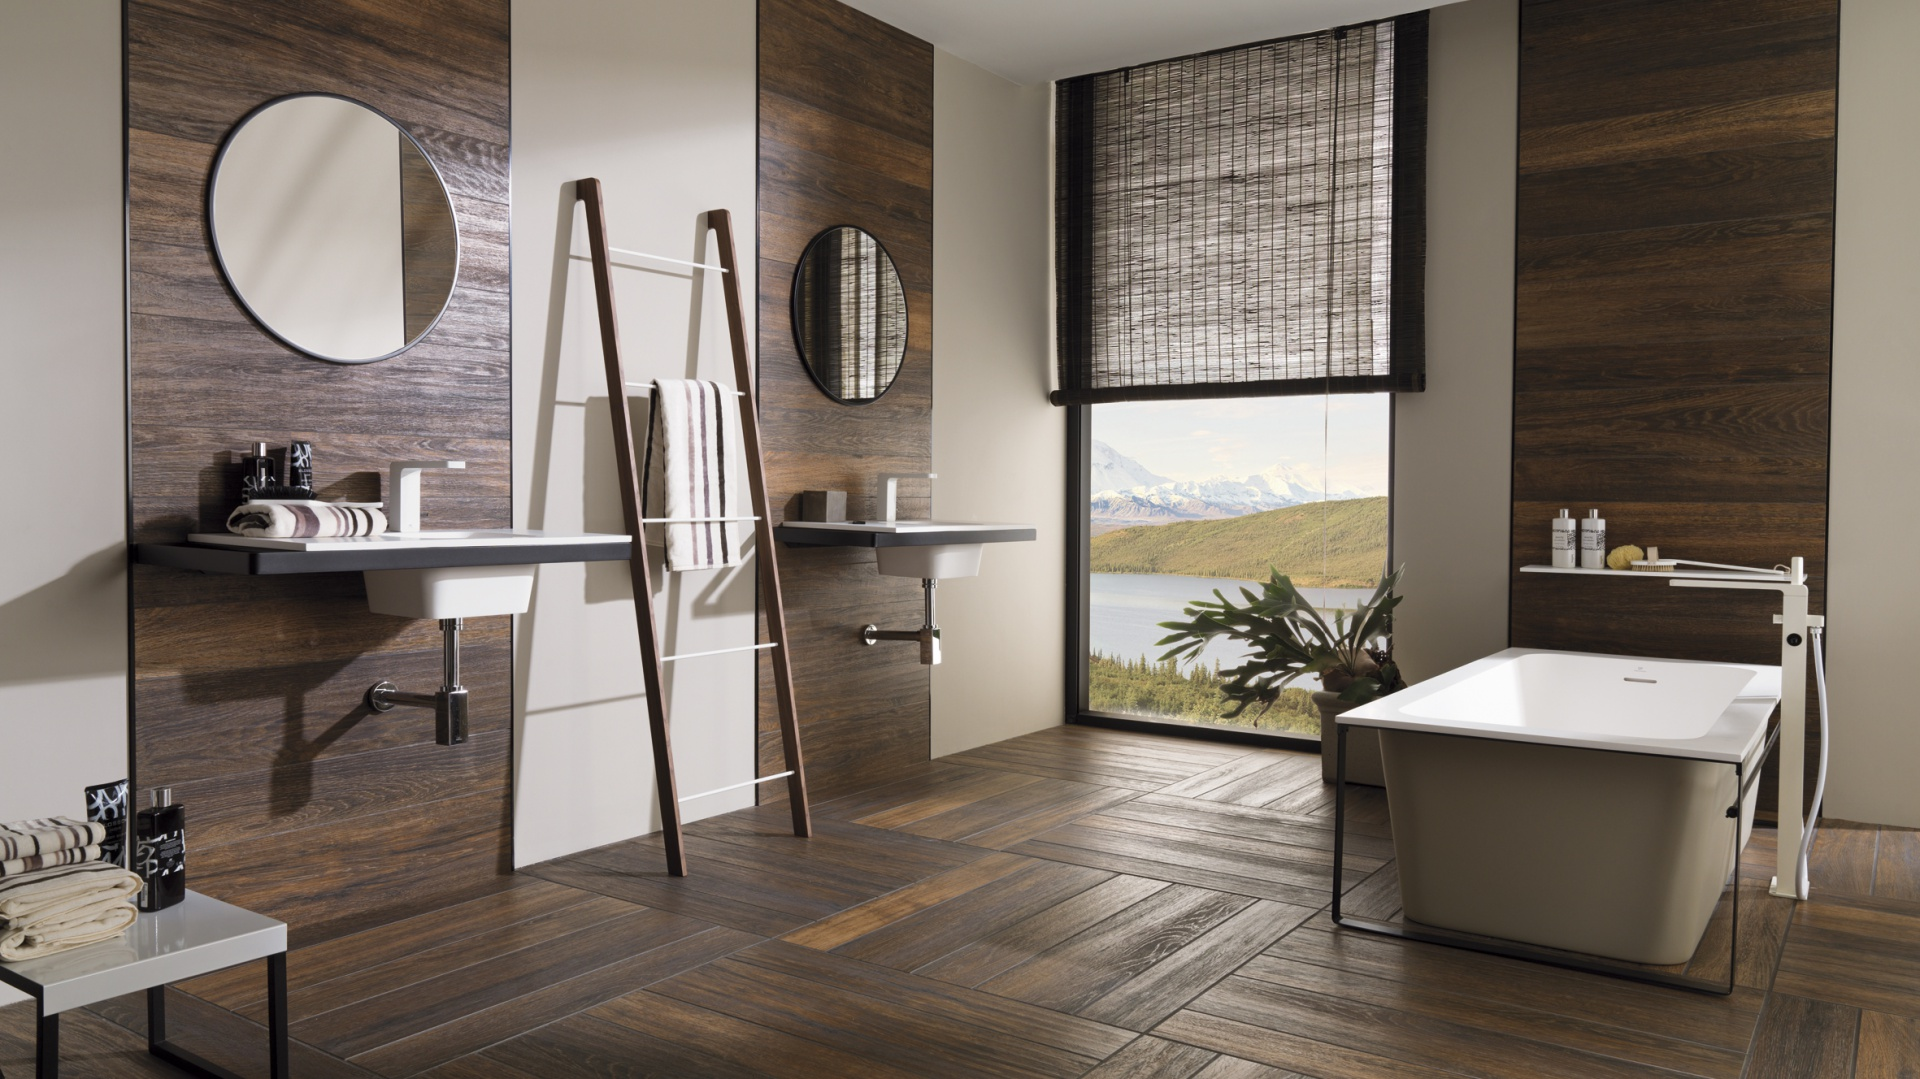 jak naturalny parkiet p ytki ceramiczne jak drewno 15 kolekcji do azienki. Black Bedroom Furniture Sets. Home Design Ideas